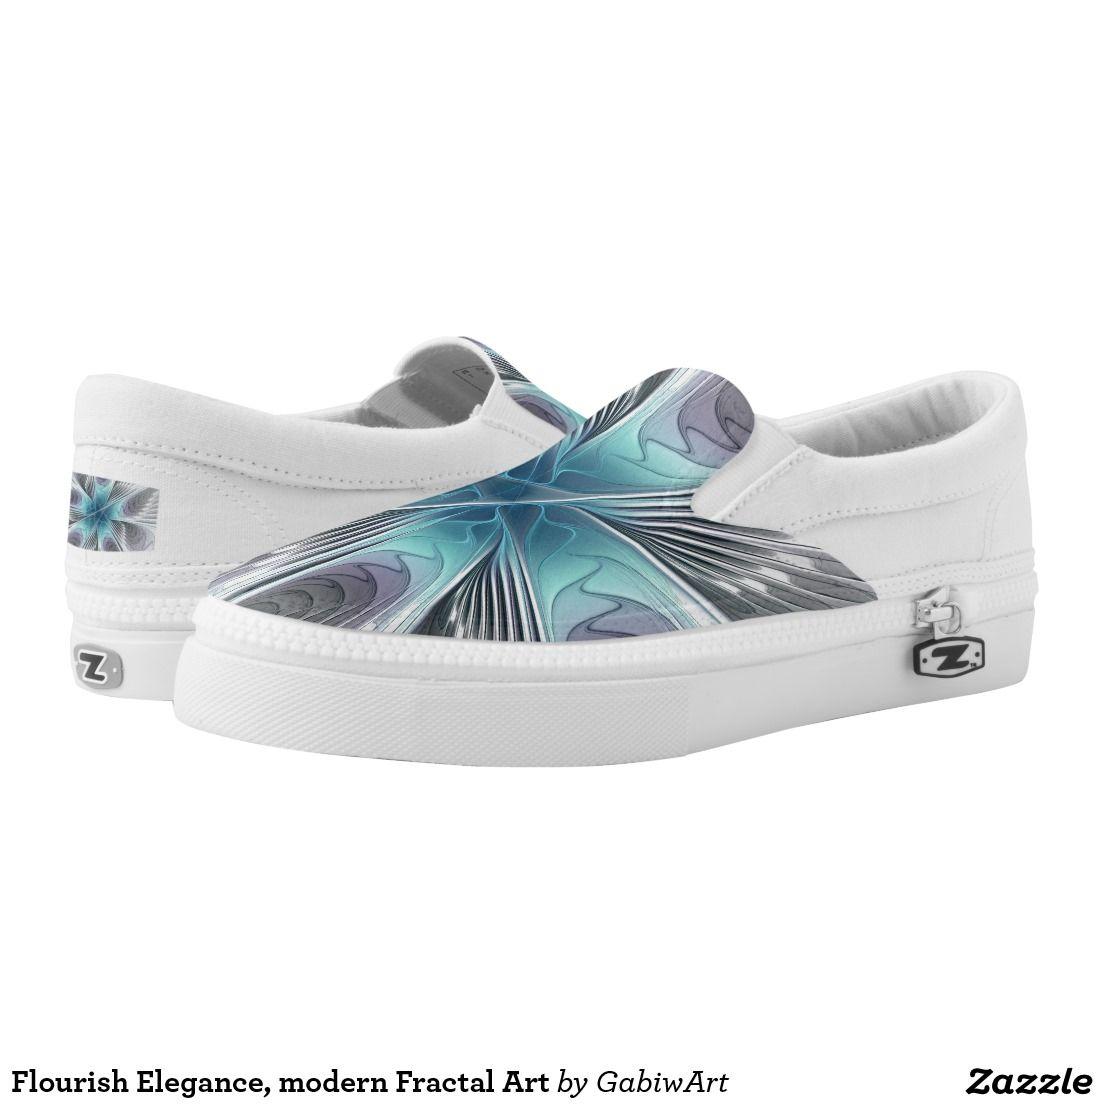 Flourish Elegance, modern Fractal Art Printed Shoes